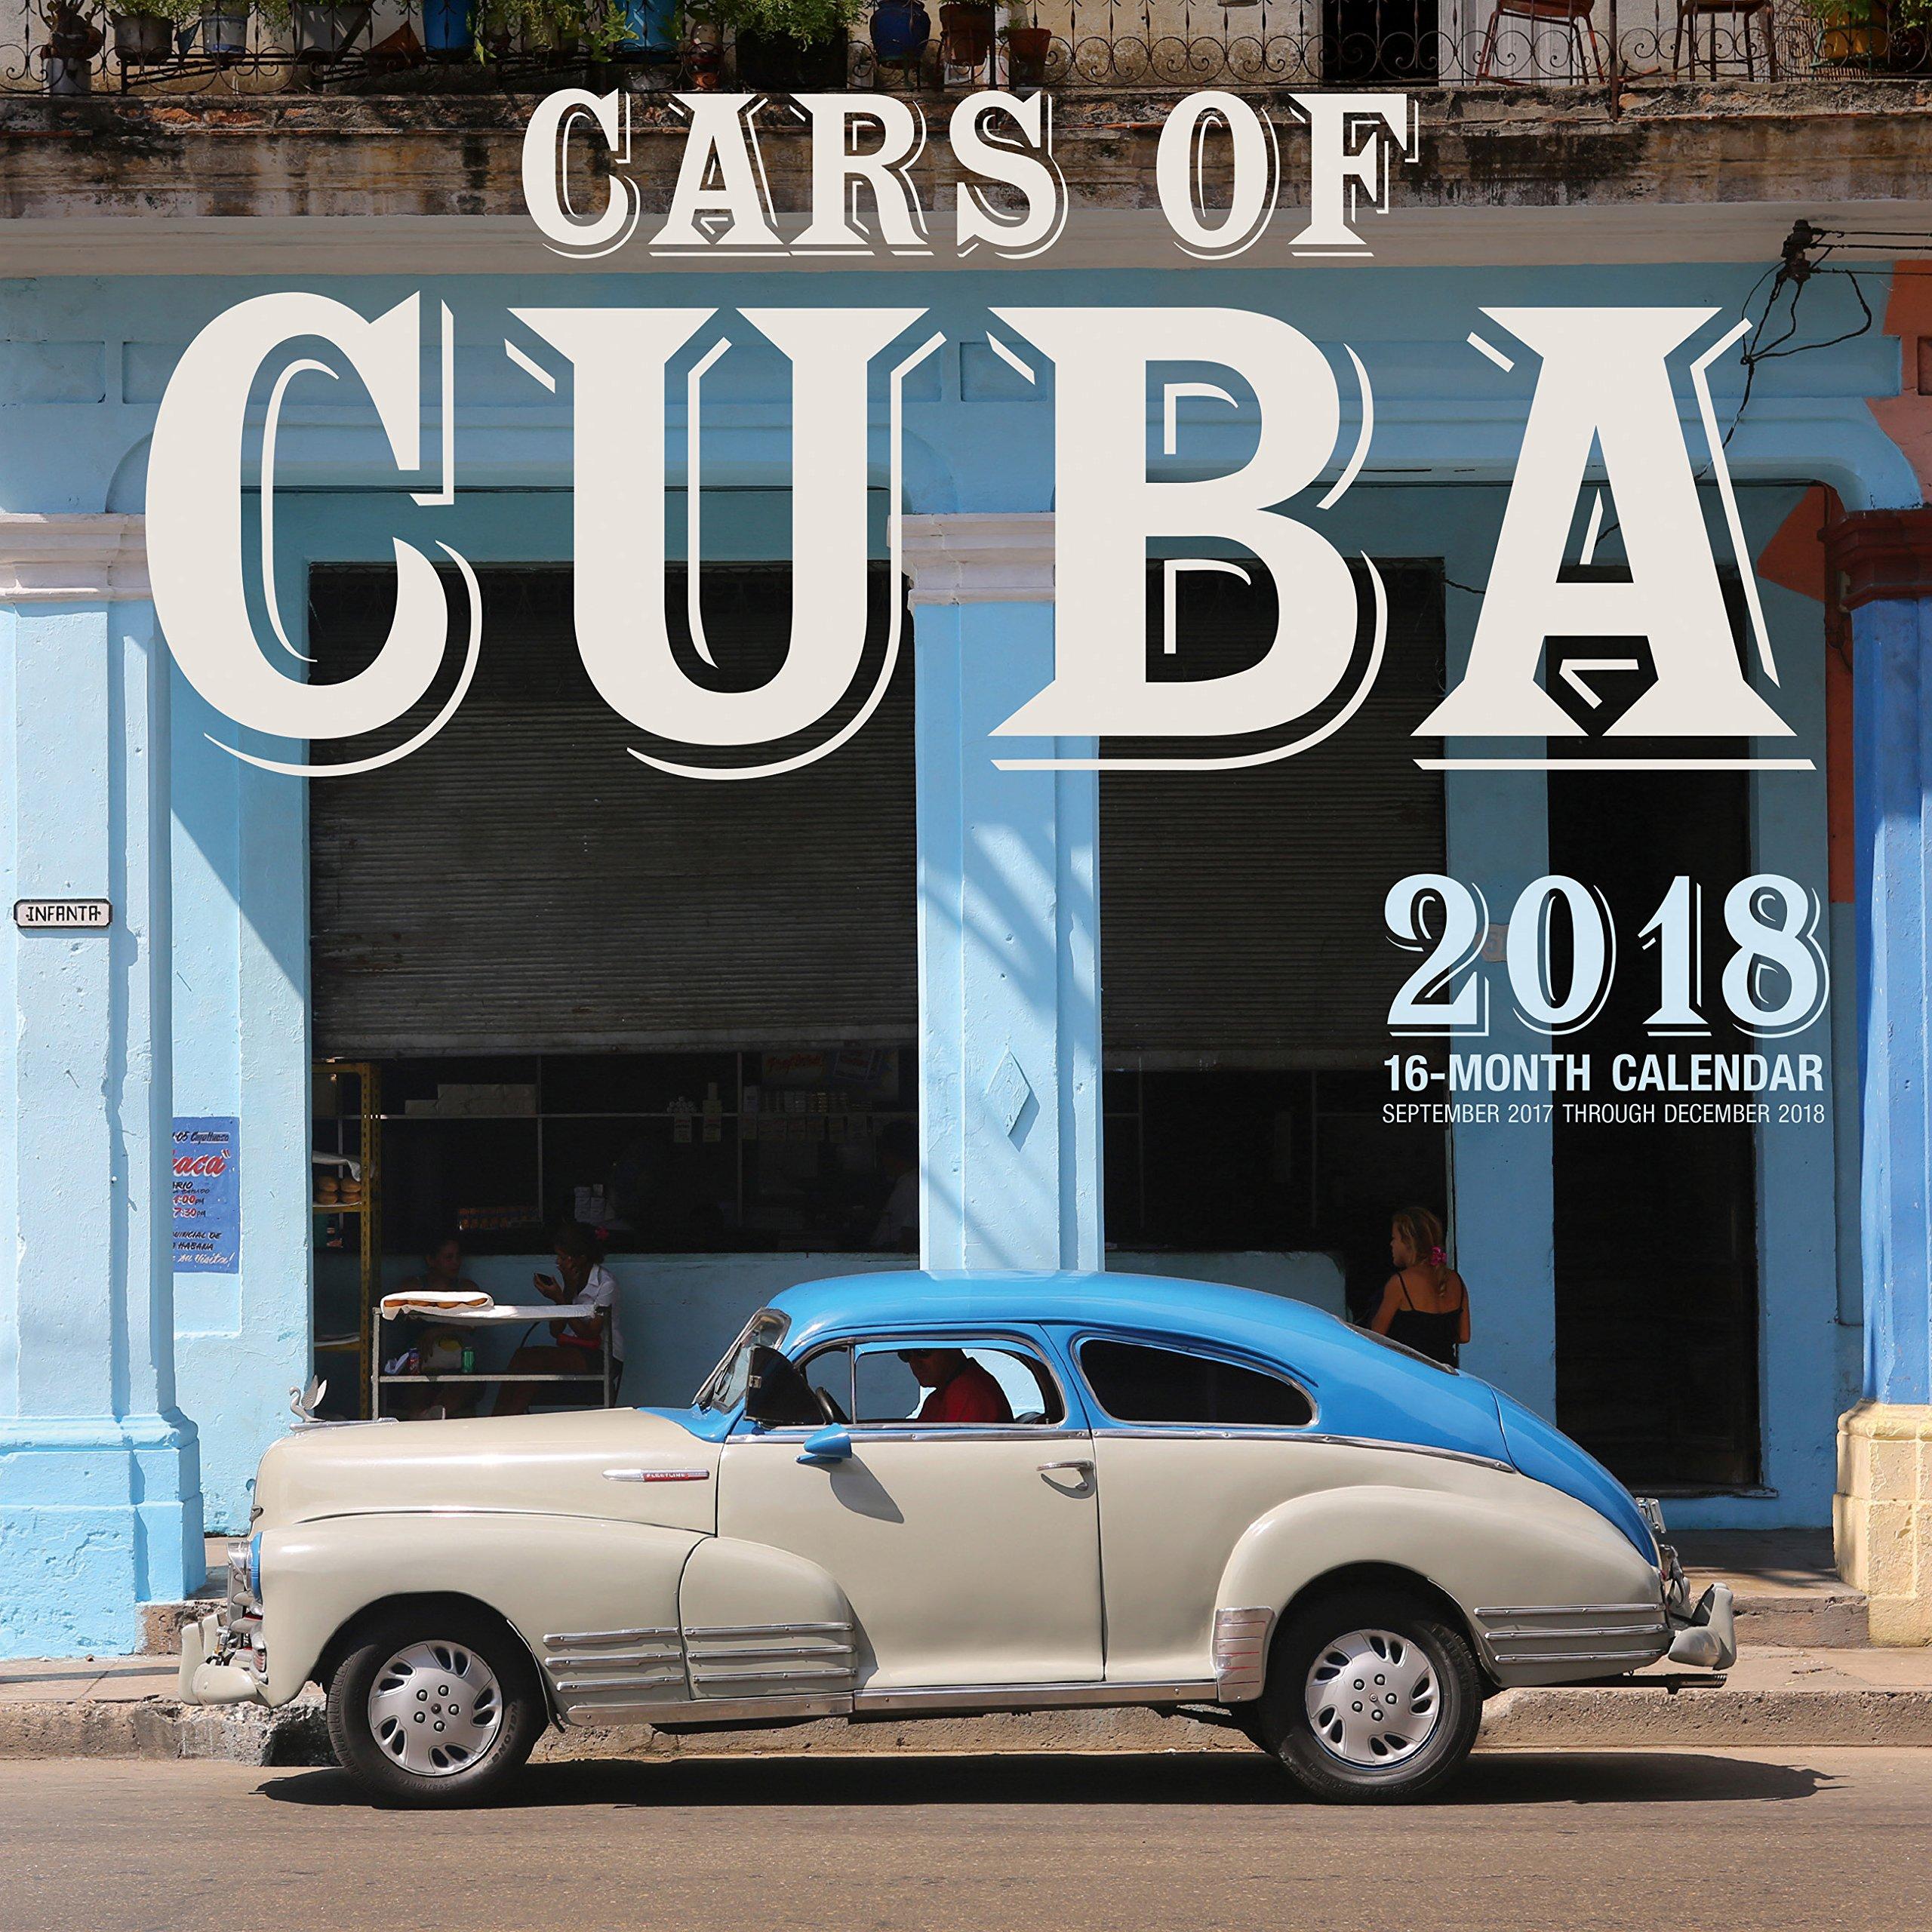 Cars Of Cuba 2018 16 Month Calendar Includes September 2017 Through